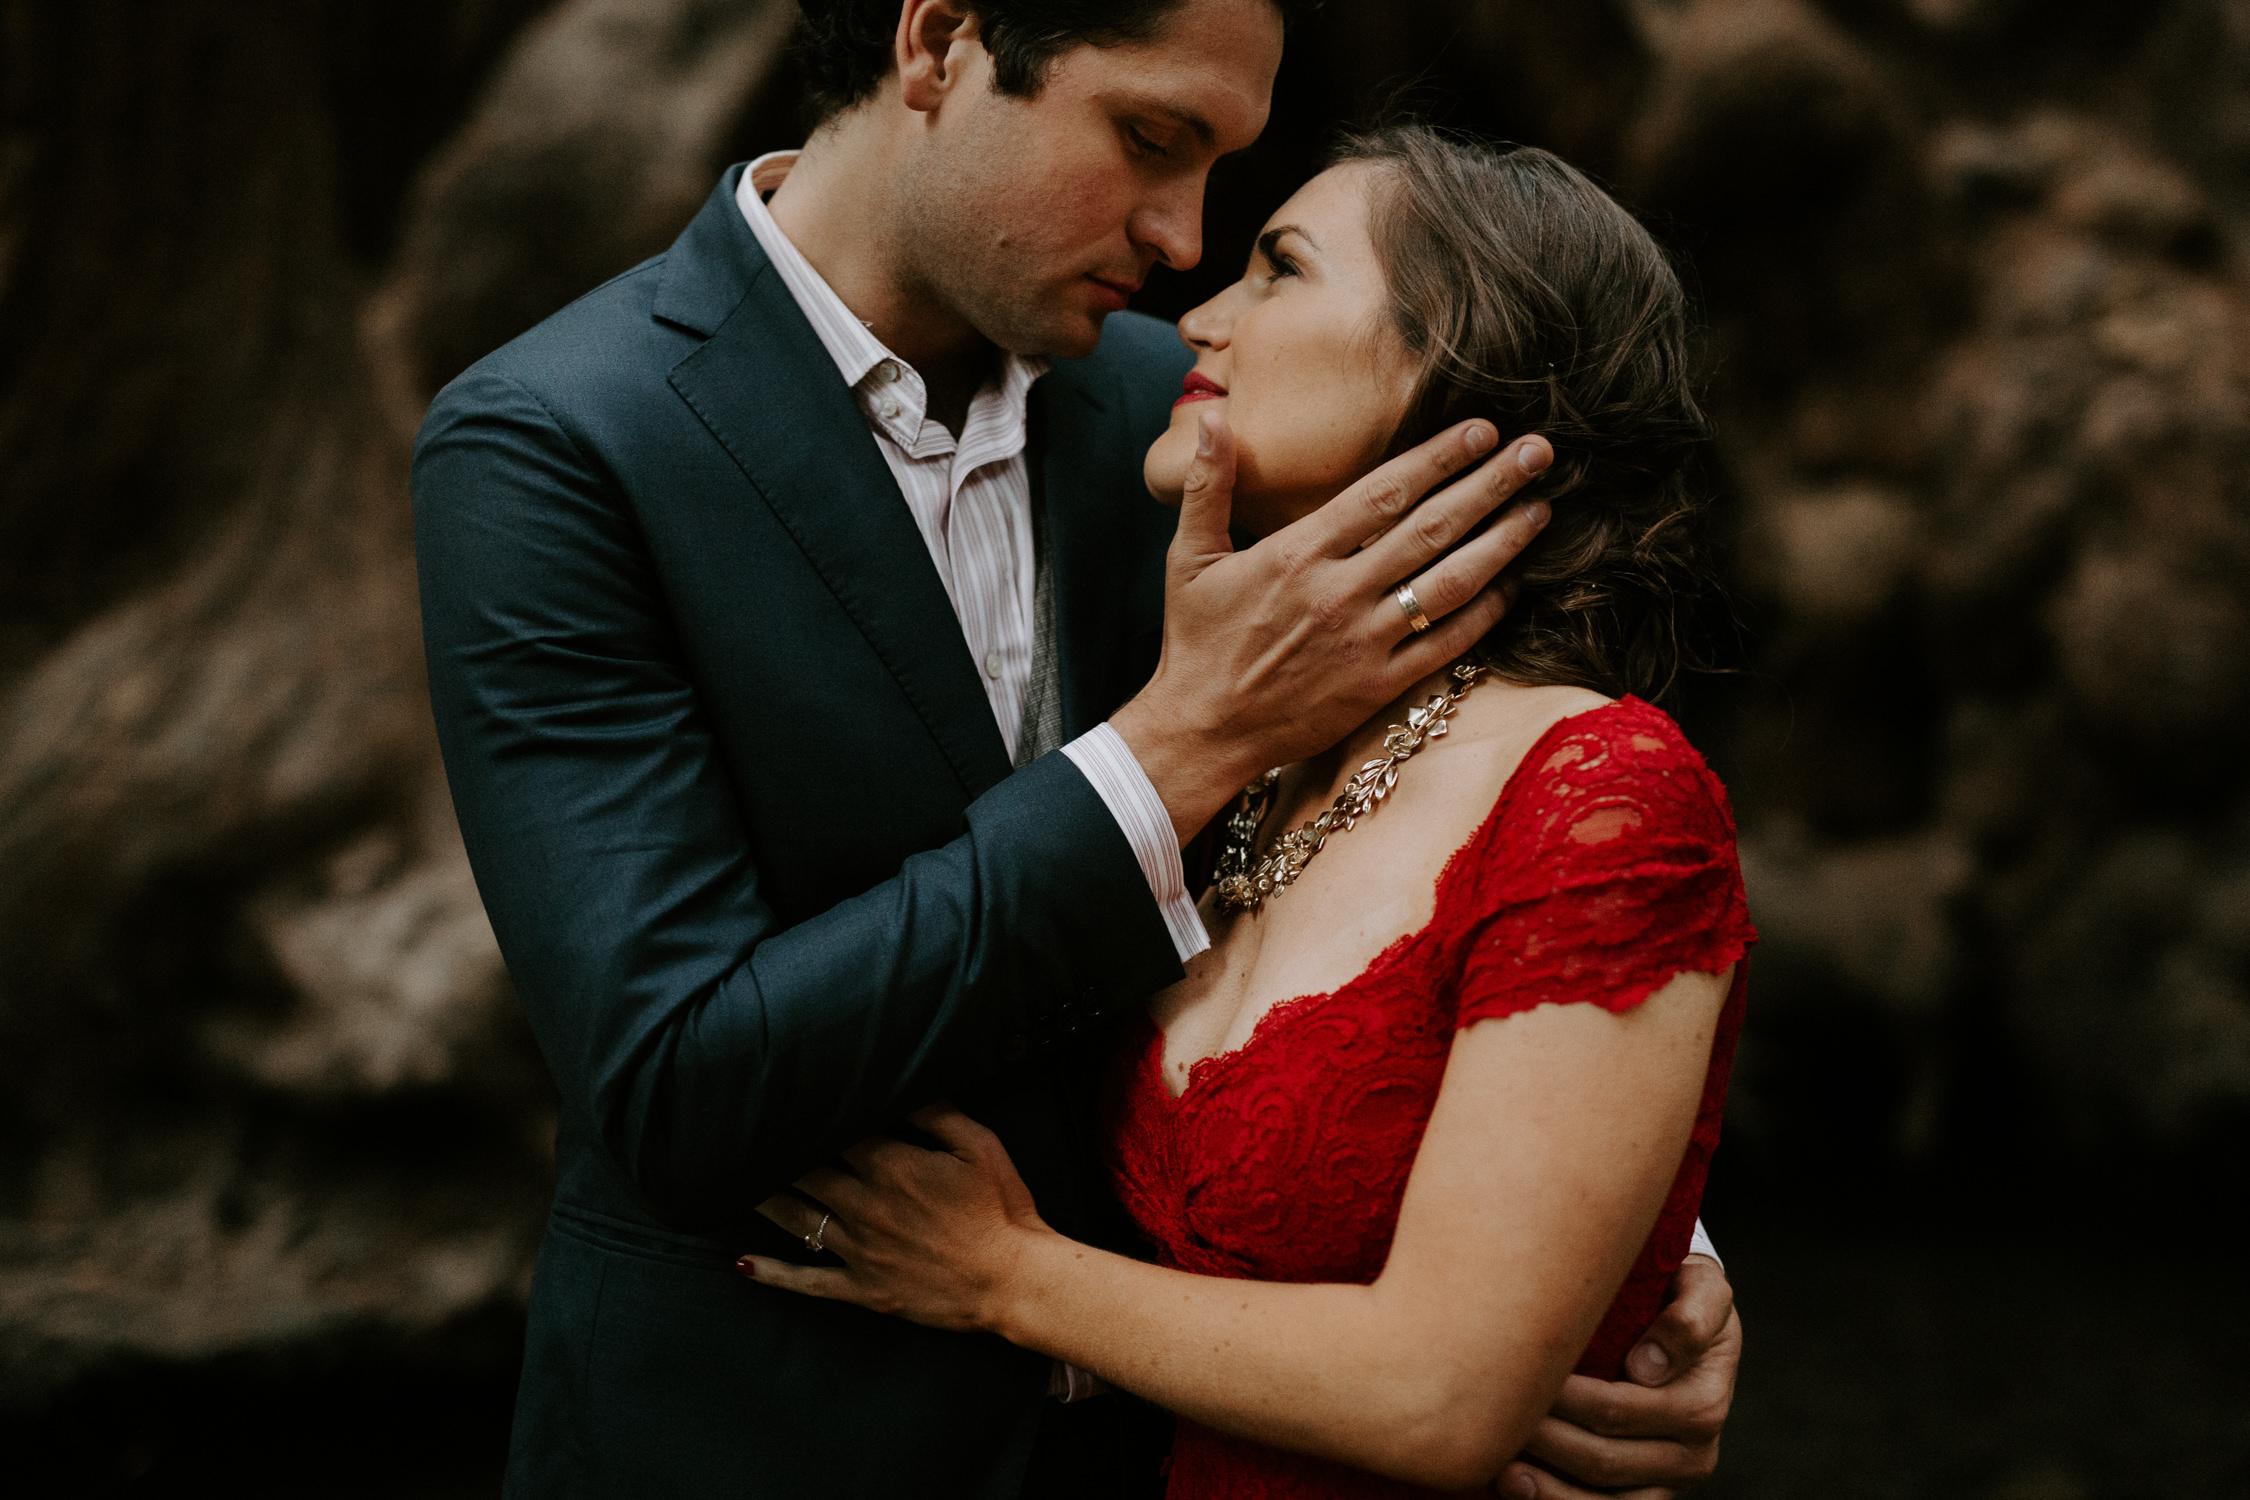 couple-intimate-engagement-session-mt-tam-38.jpg